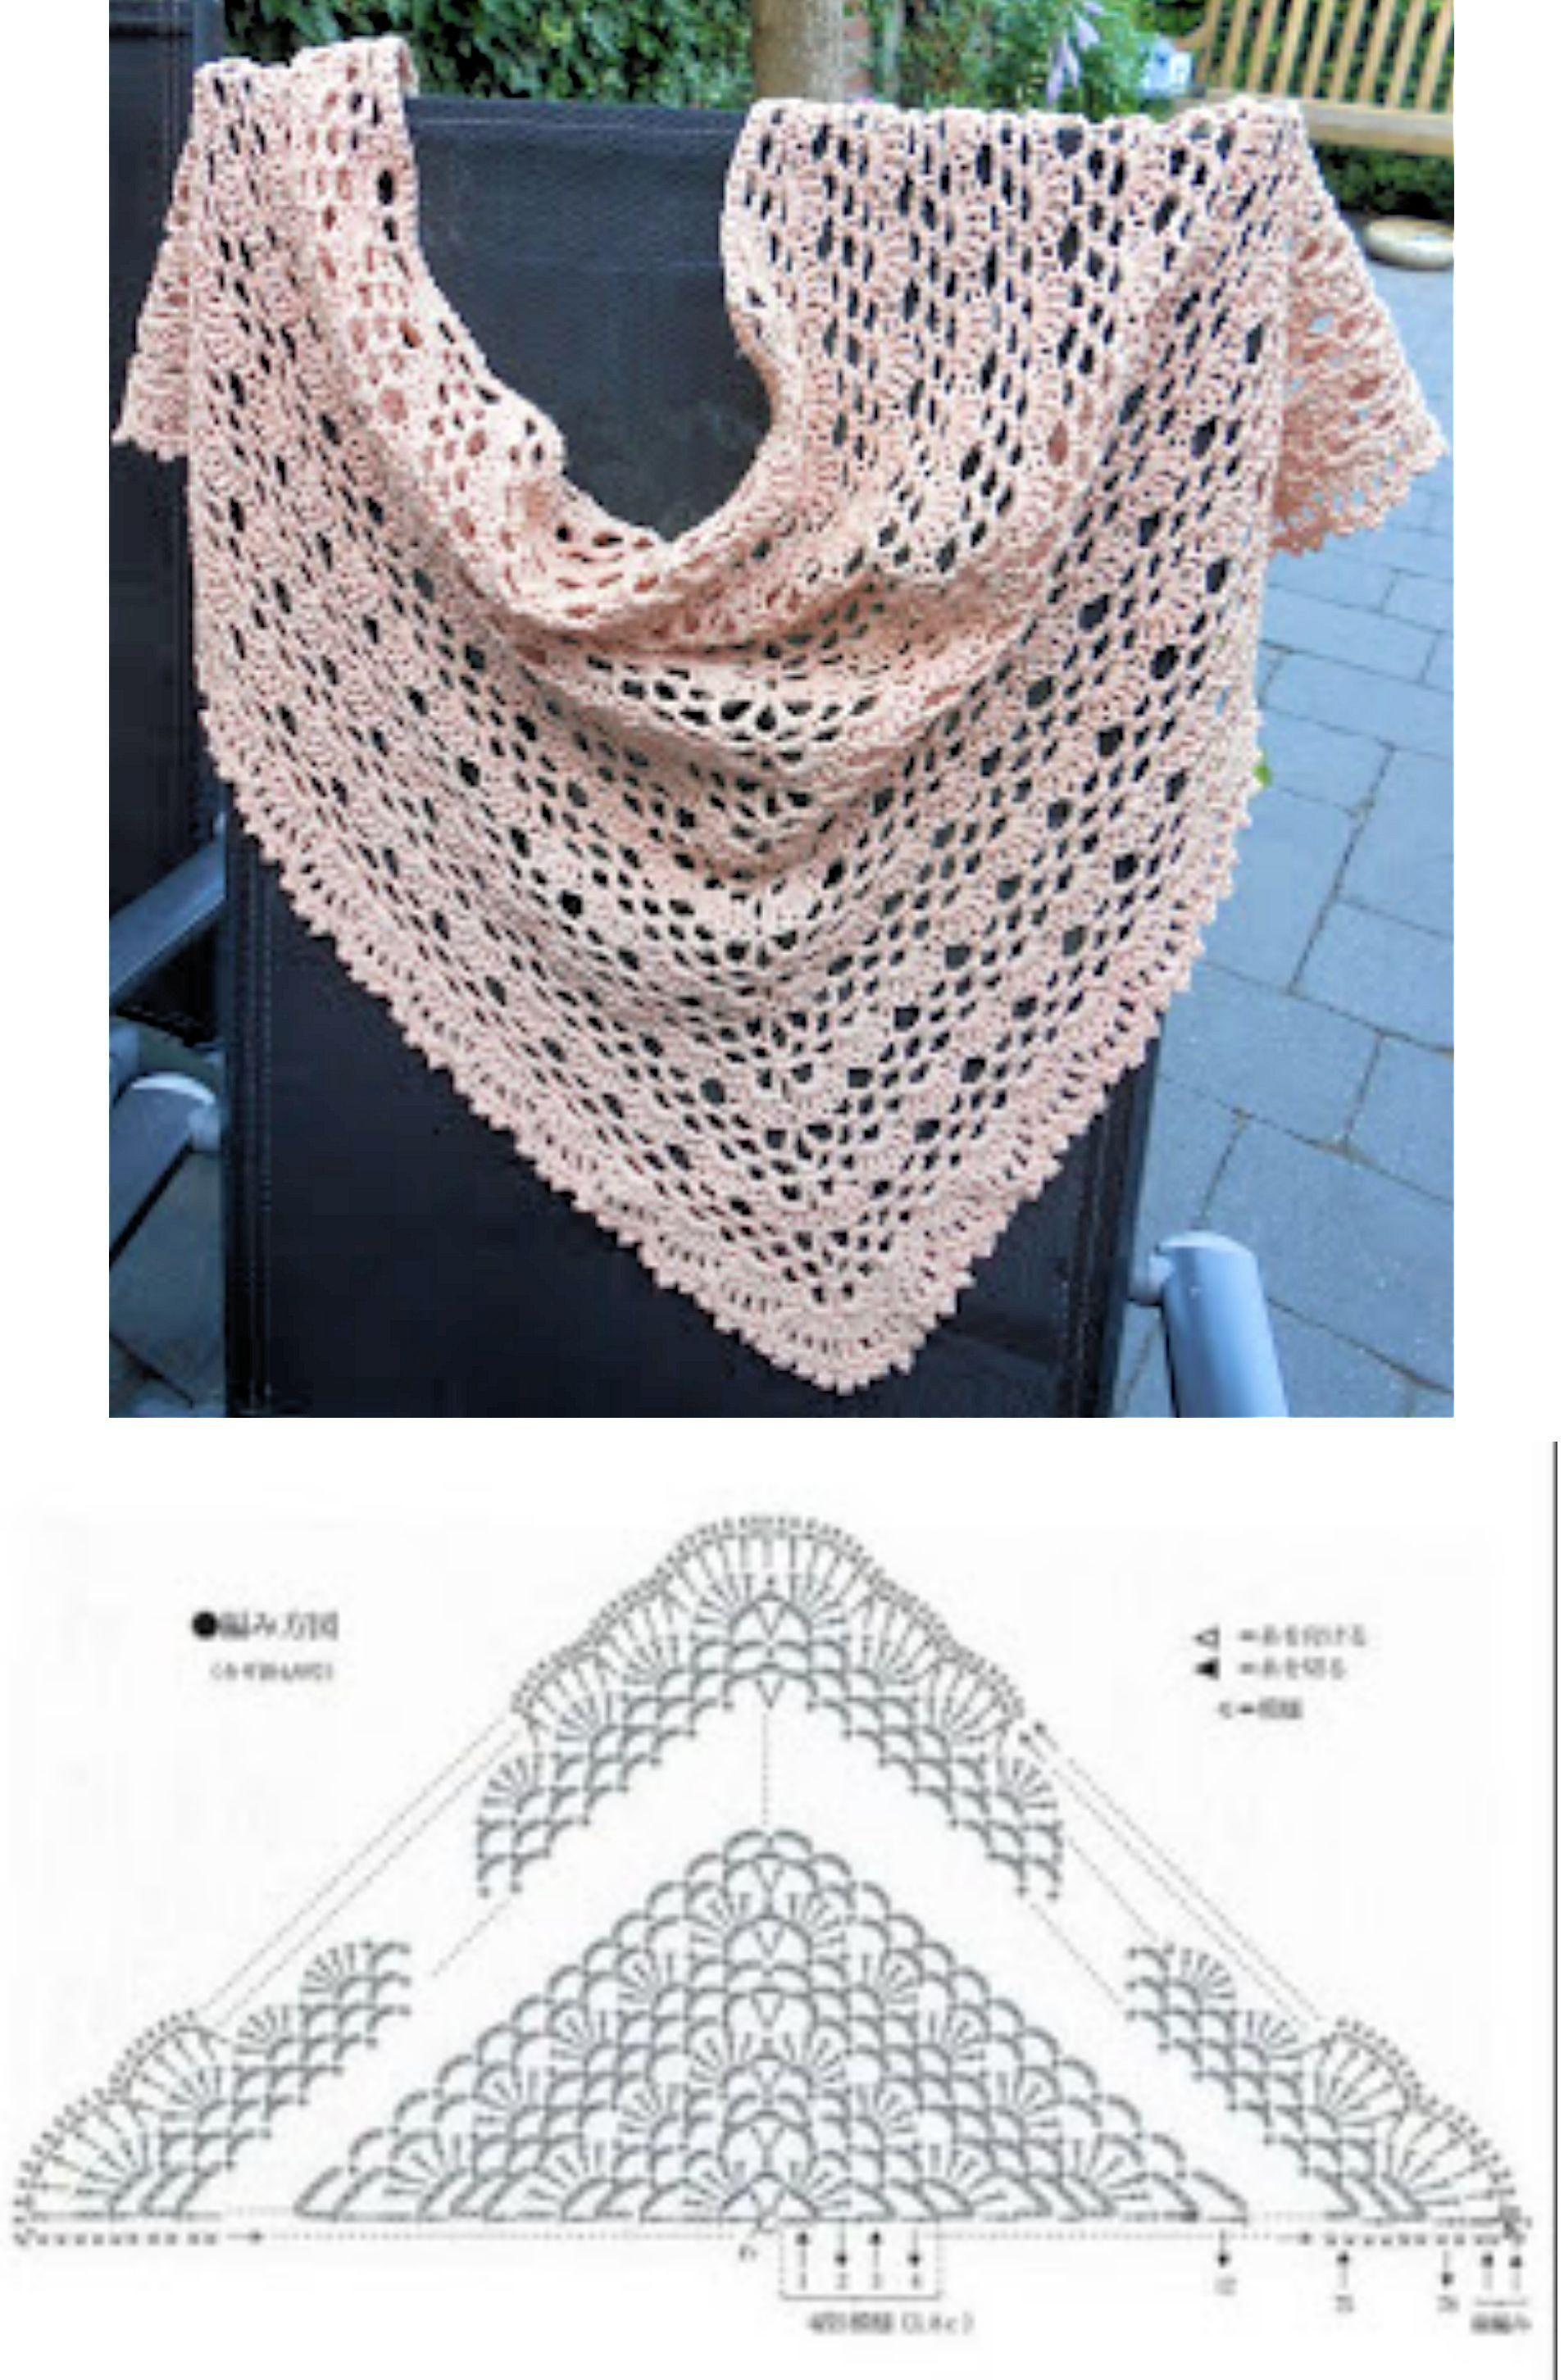 Pin von Bianca BZH auf Châle crochet   Pinterest   Tücher ...